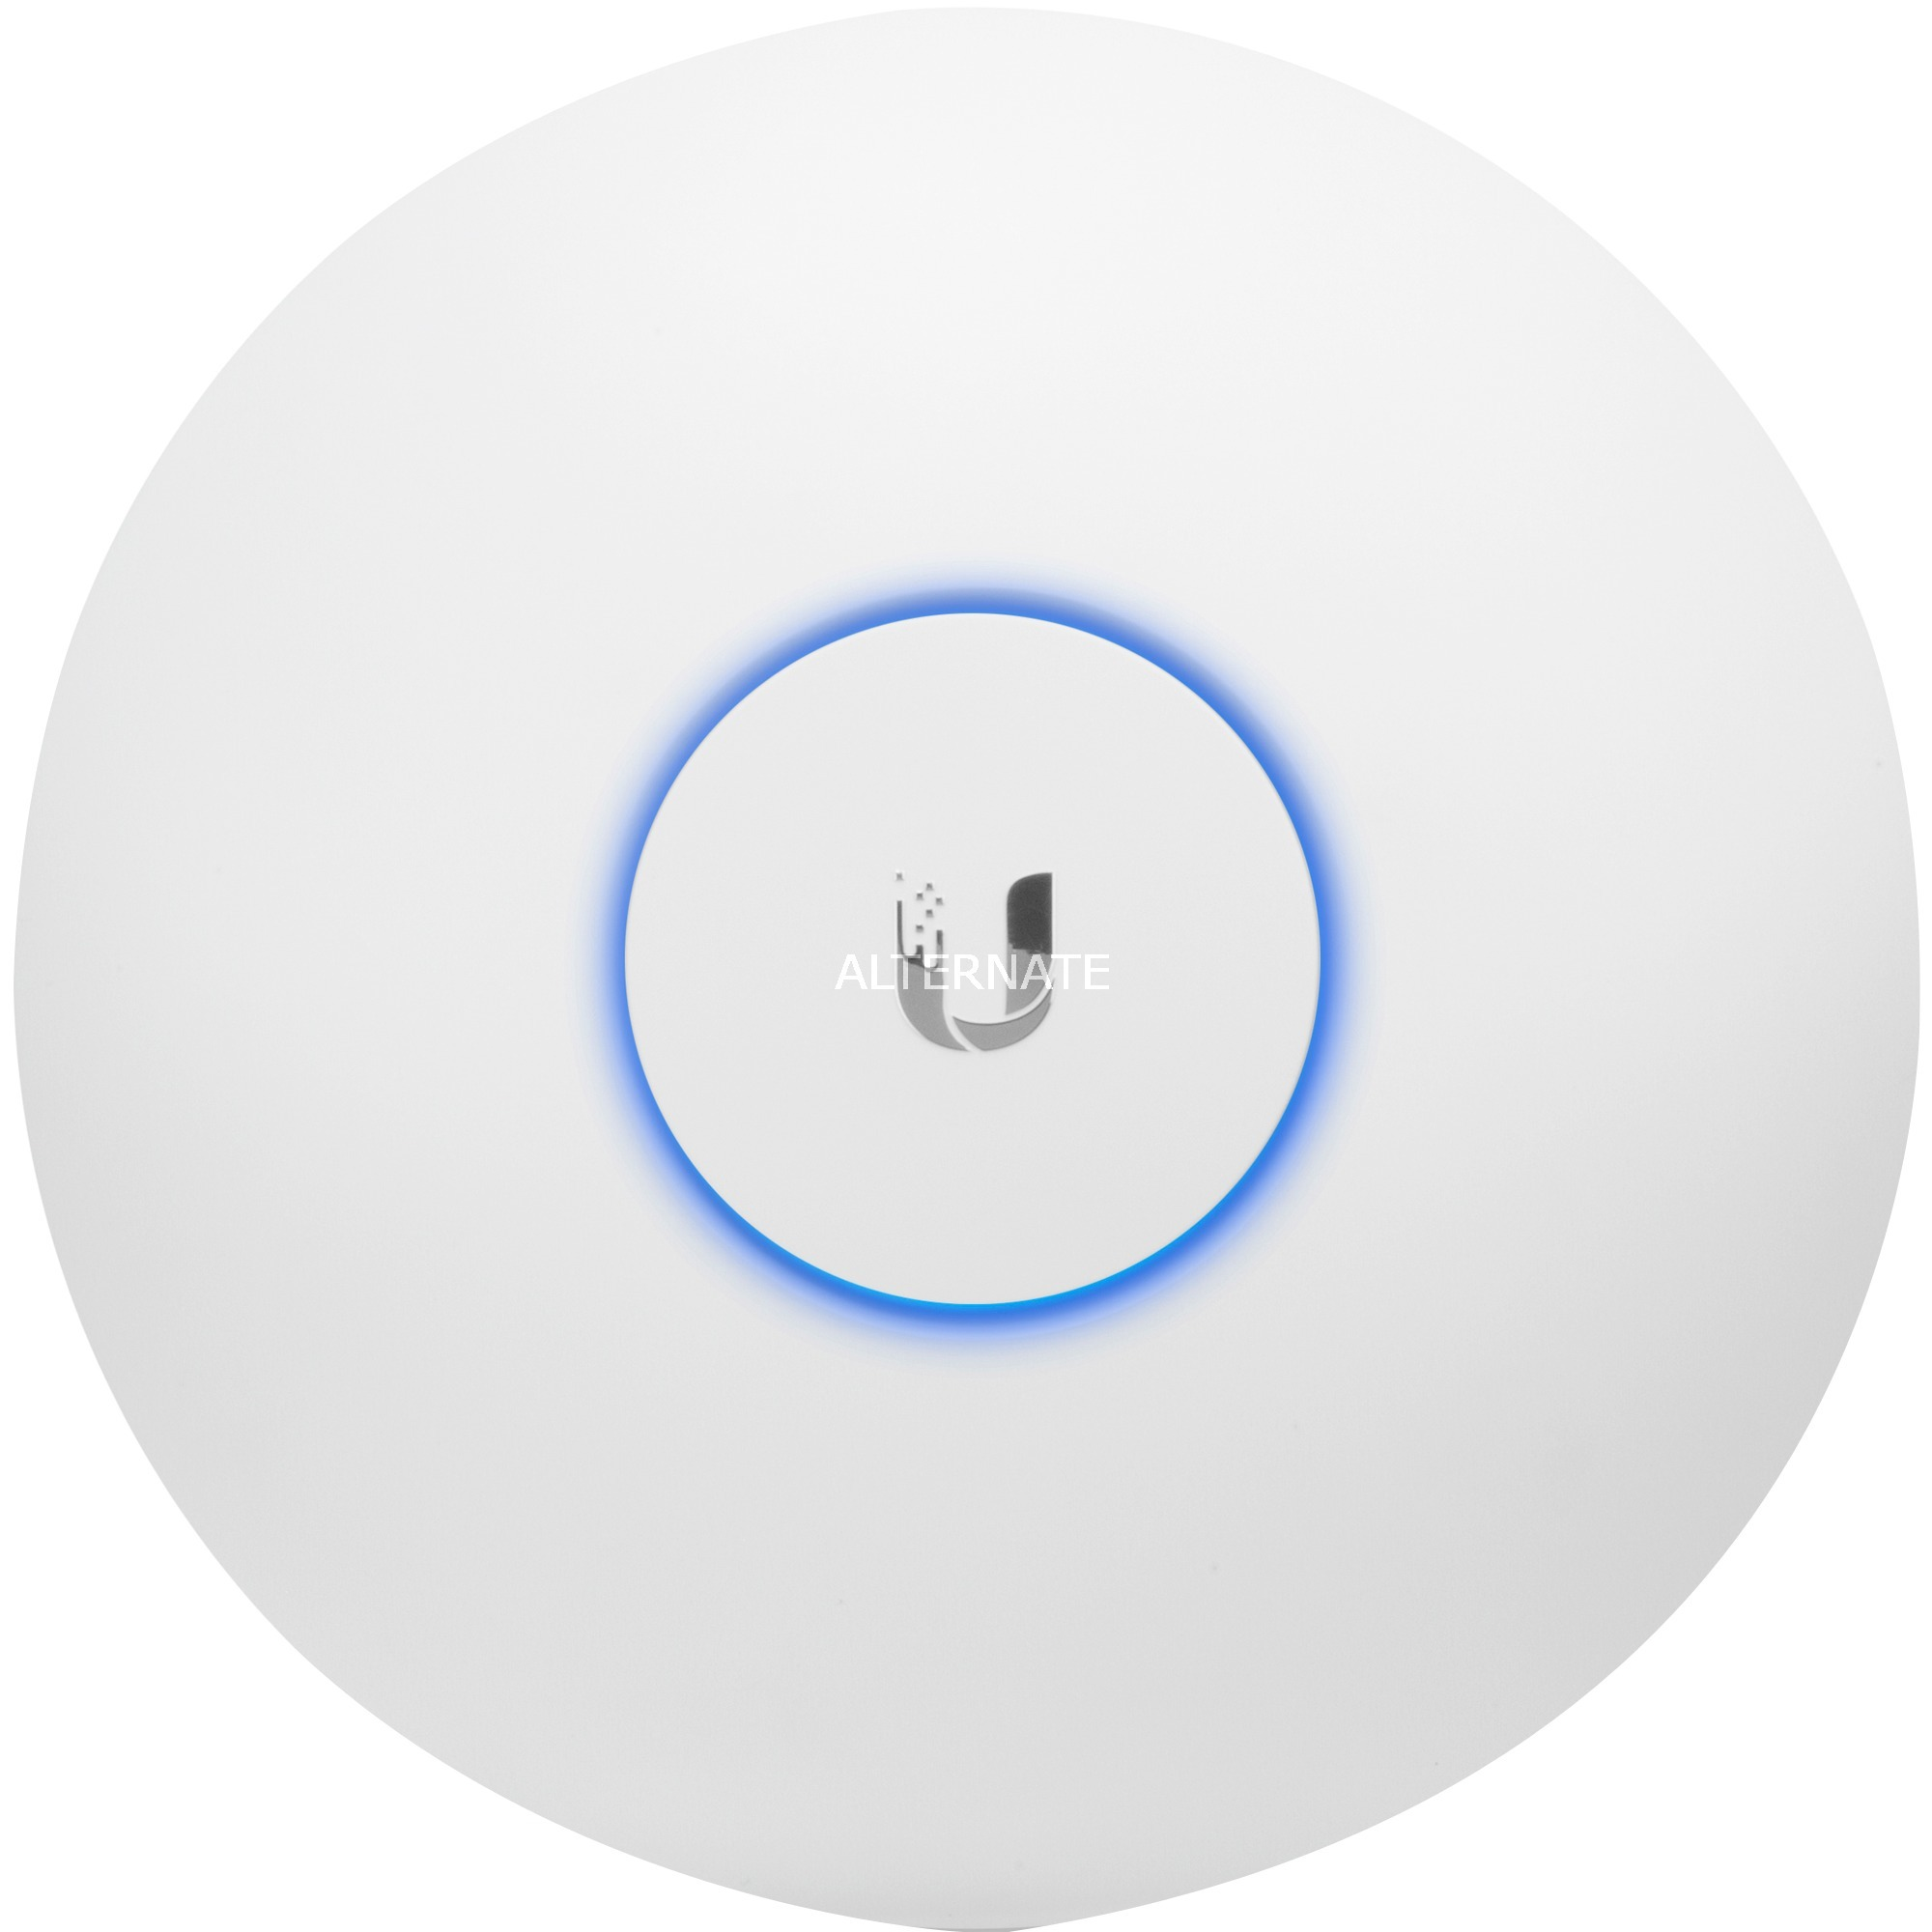 Enterprise AP-LR UniFi punto de acceso WLAN 300 Mbit/s Energía sobre Ethernet (PoE)